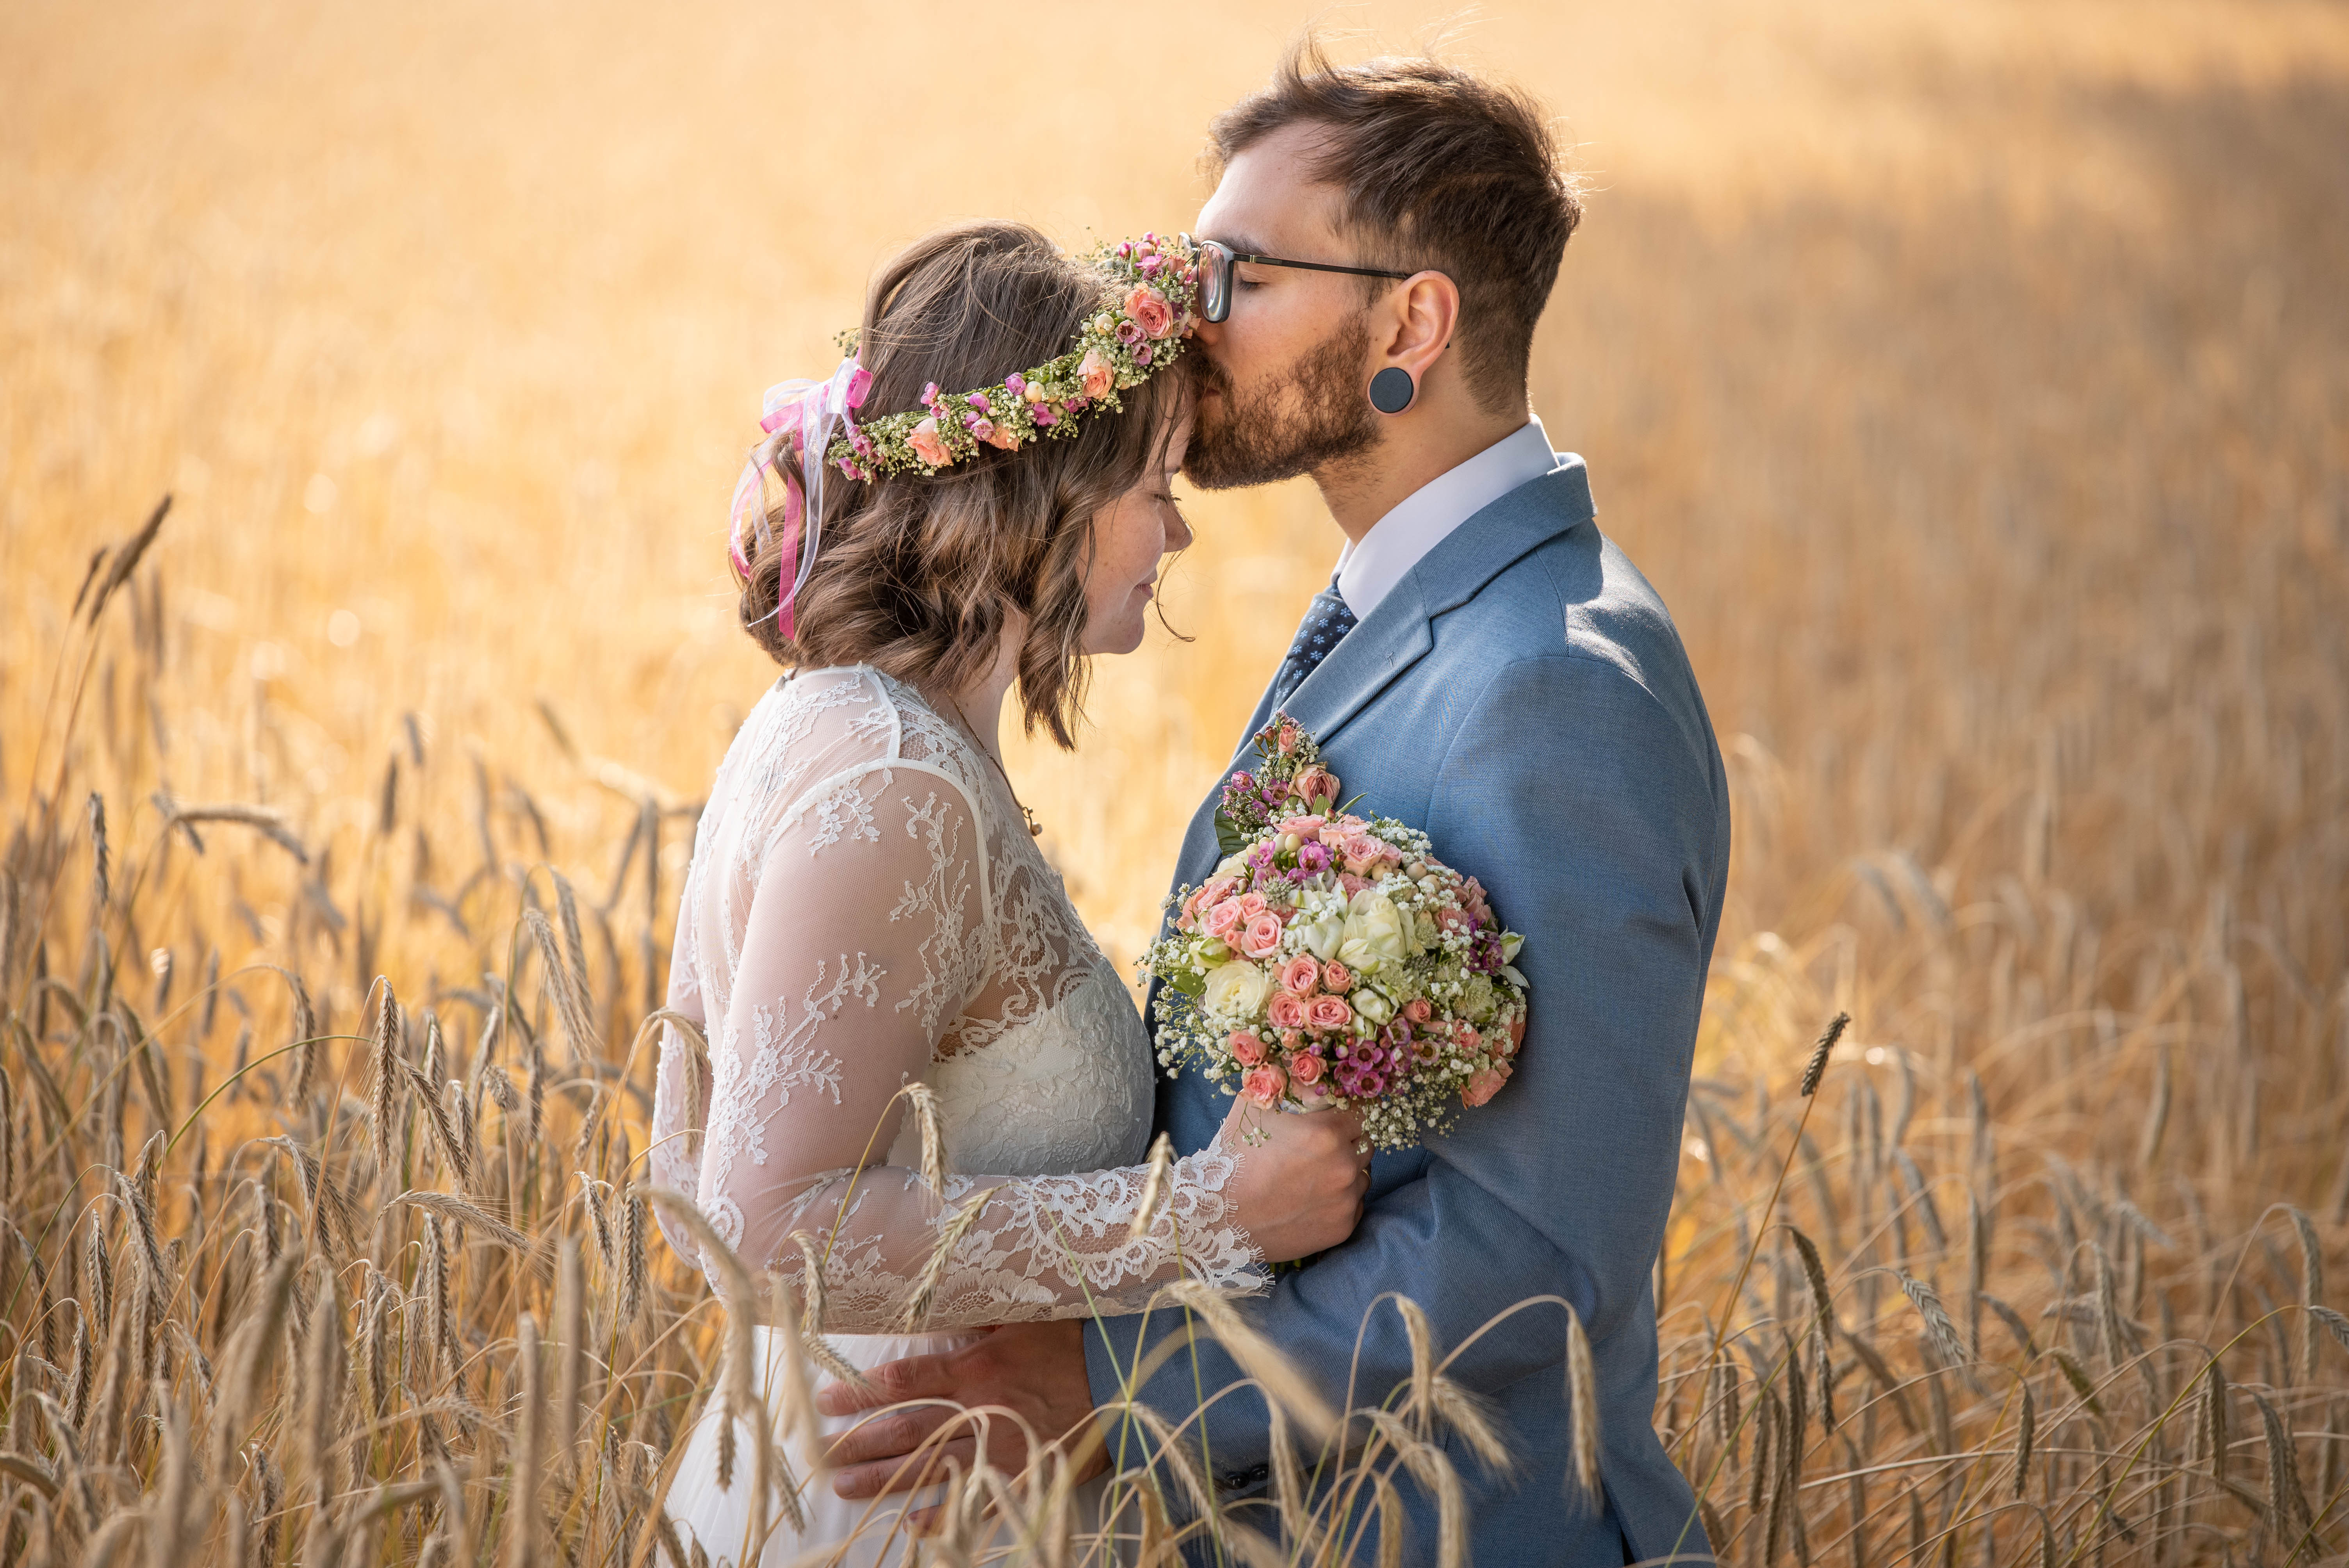 Hochzeits/ After Wedding-Shooting